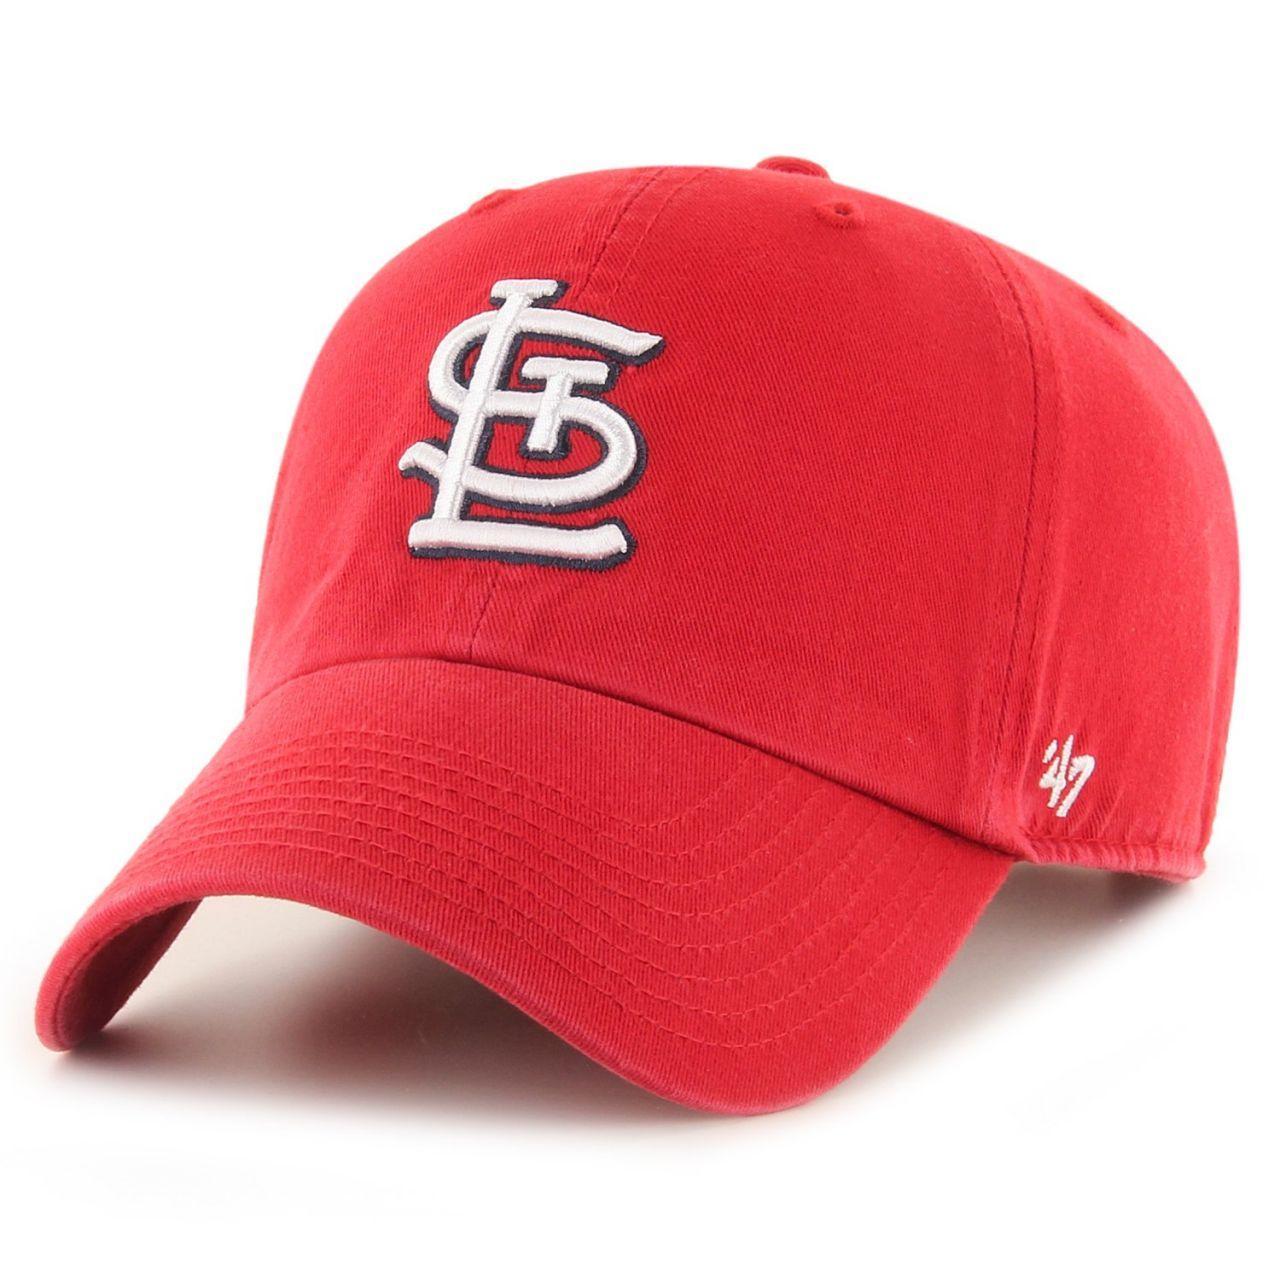 amfoo - 47 Brand Adjustable Cap - CLEAN UP St Louis Cardinals rot